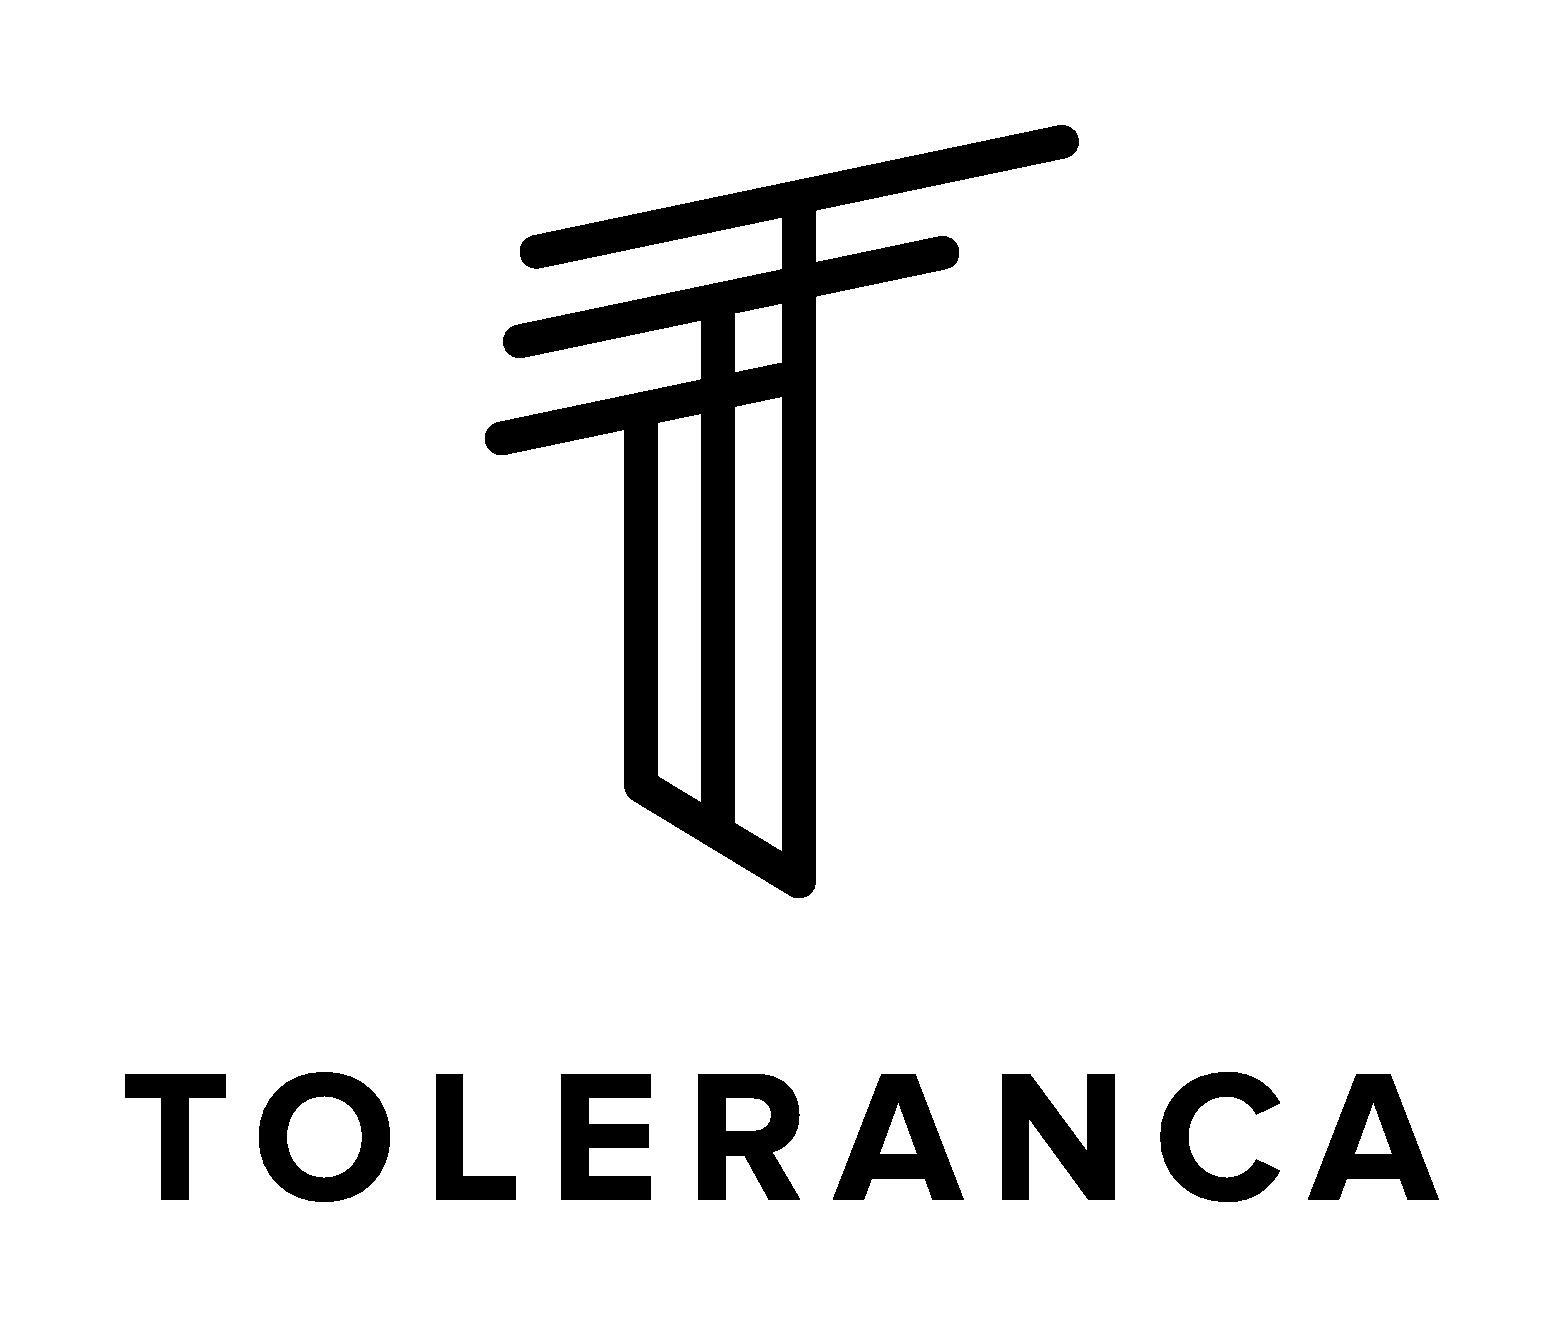 TOLERANCA MARKETING Image